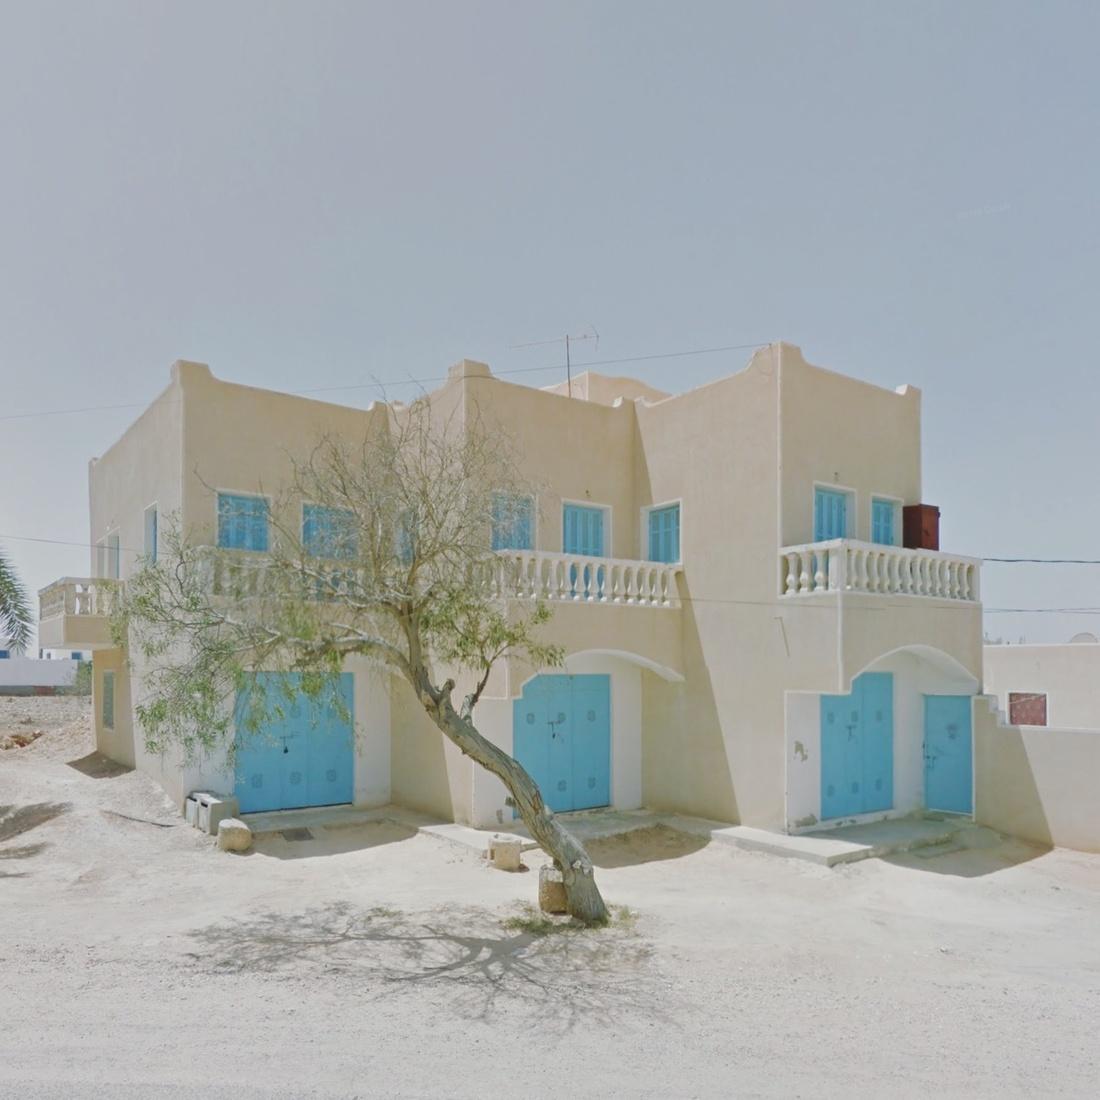 Guellaia, Medenine, Tunisia. Photograph by Jacqui Kenny via Google Street View.